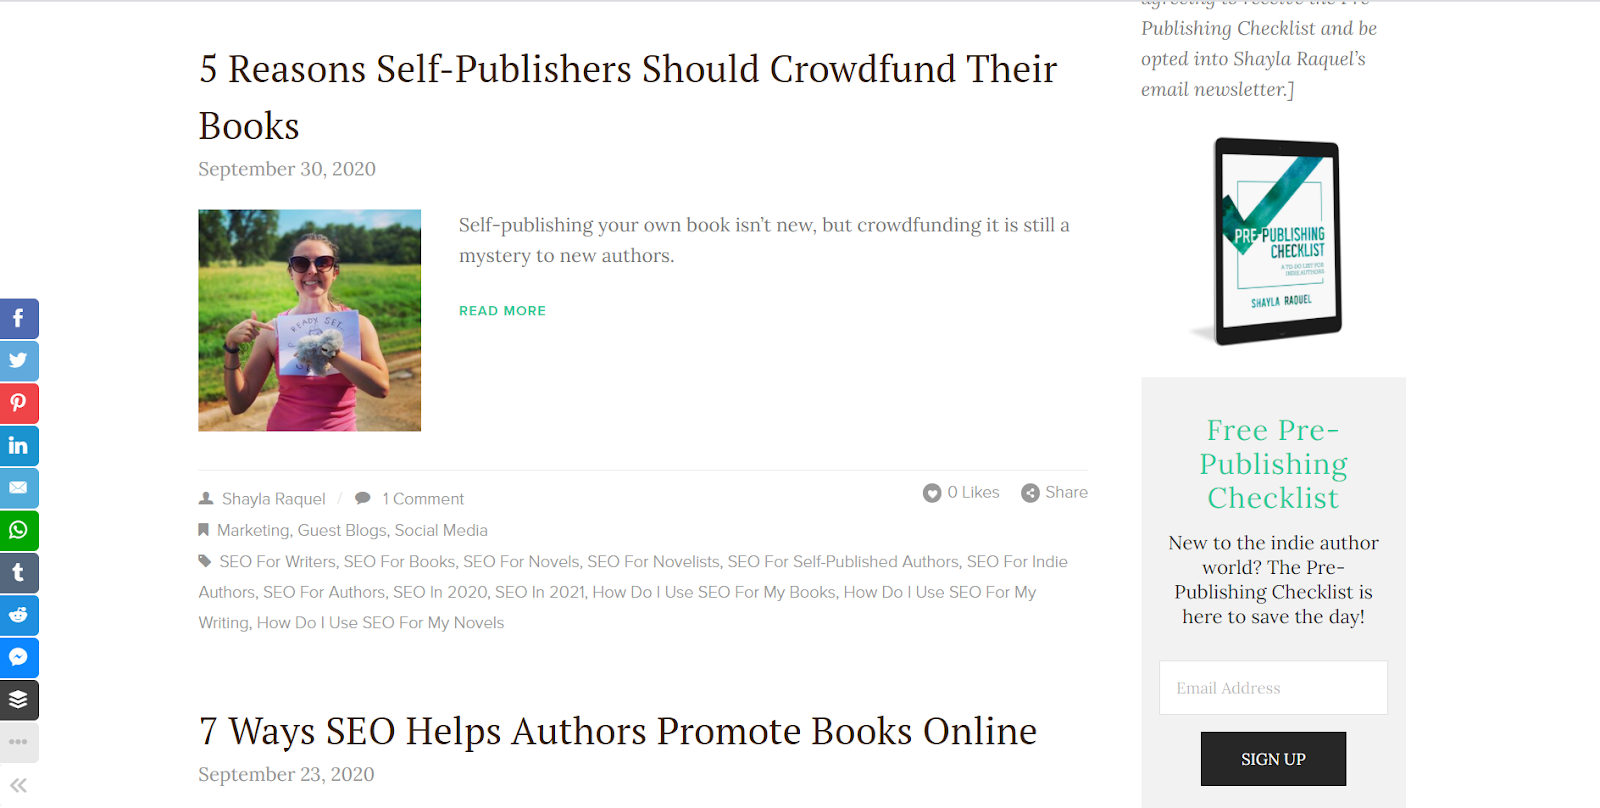 shayla raquel self-publishing